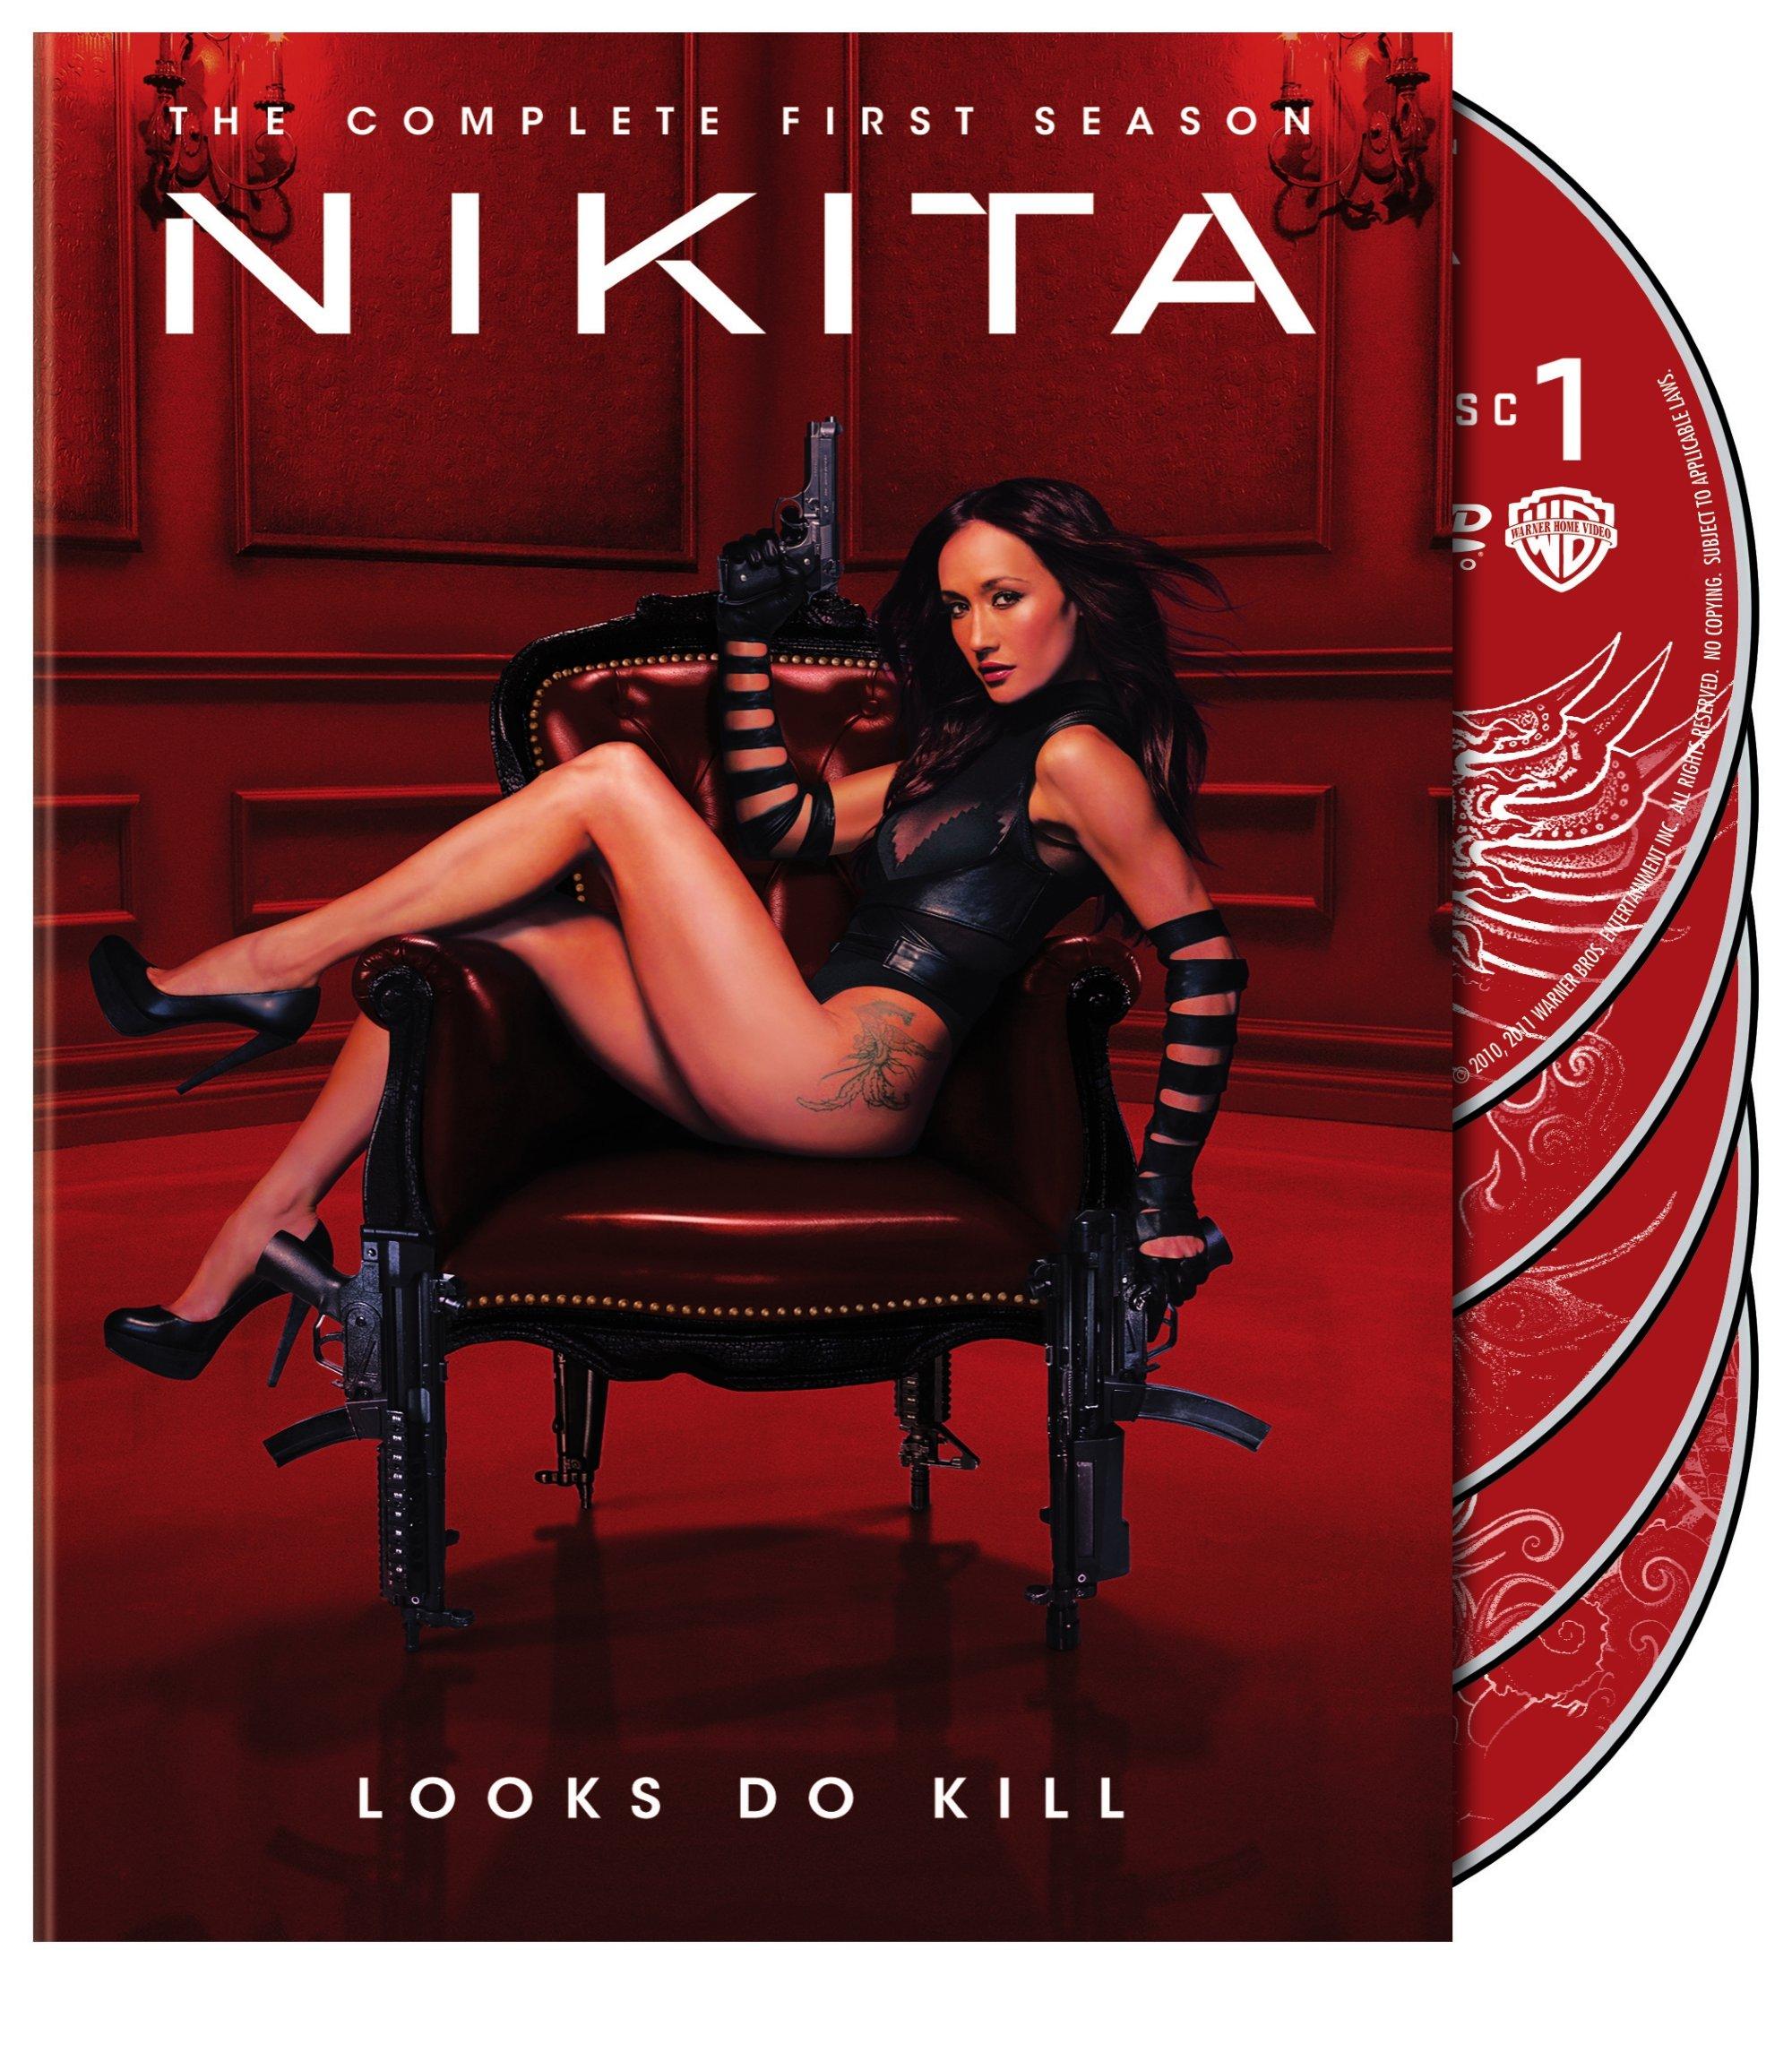 Nikita: The Complete First Season (DVD)